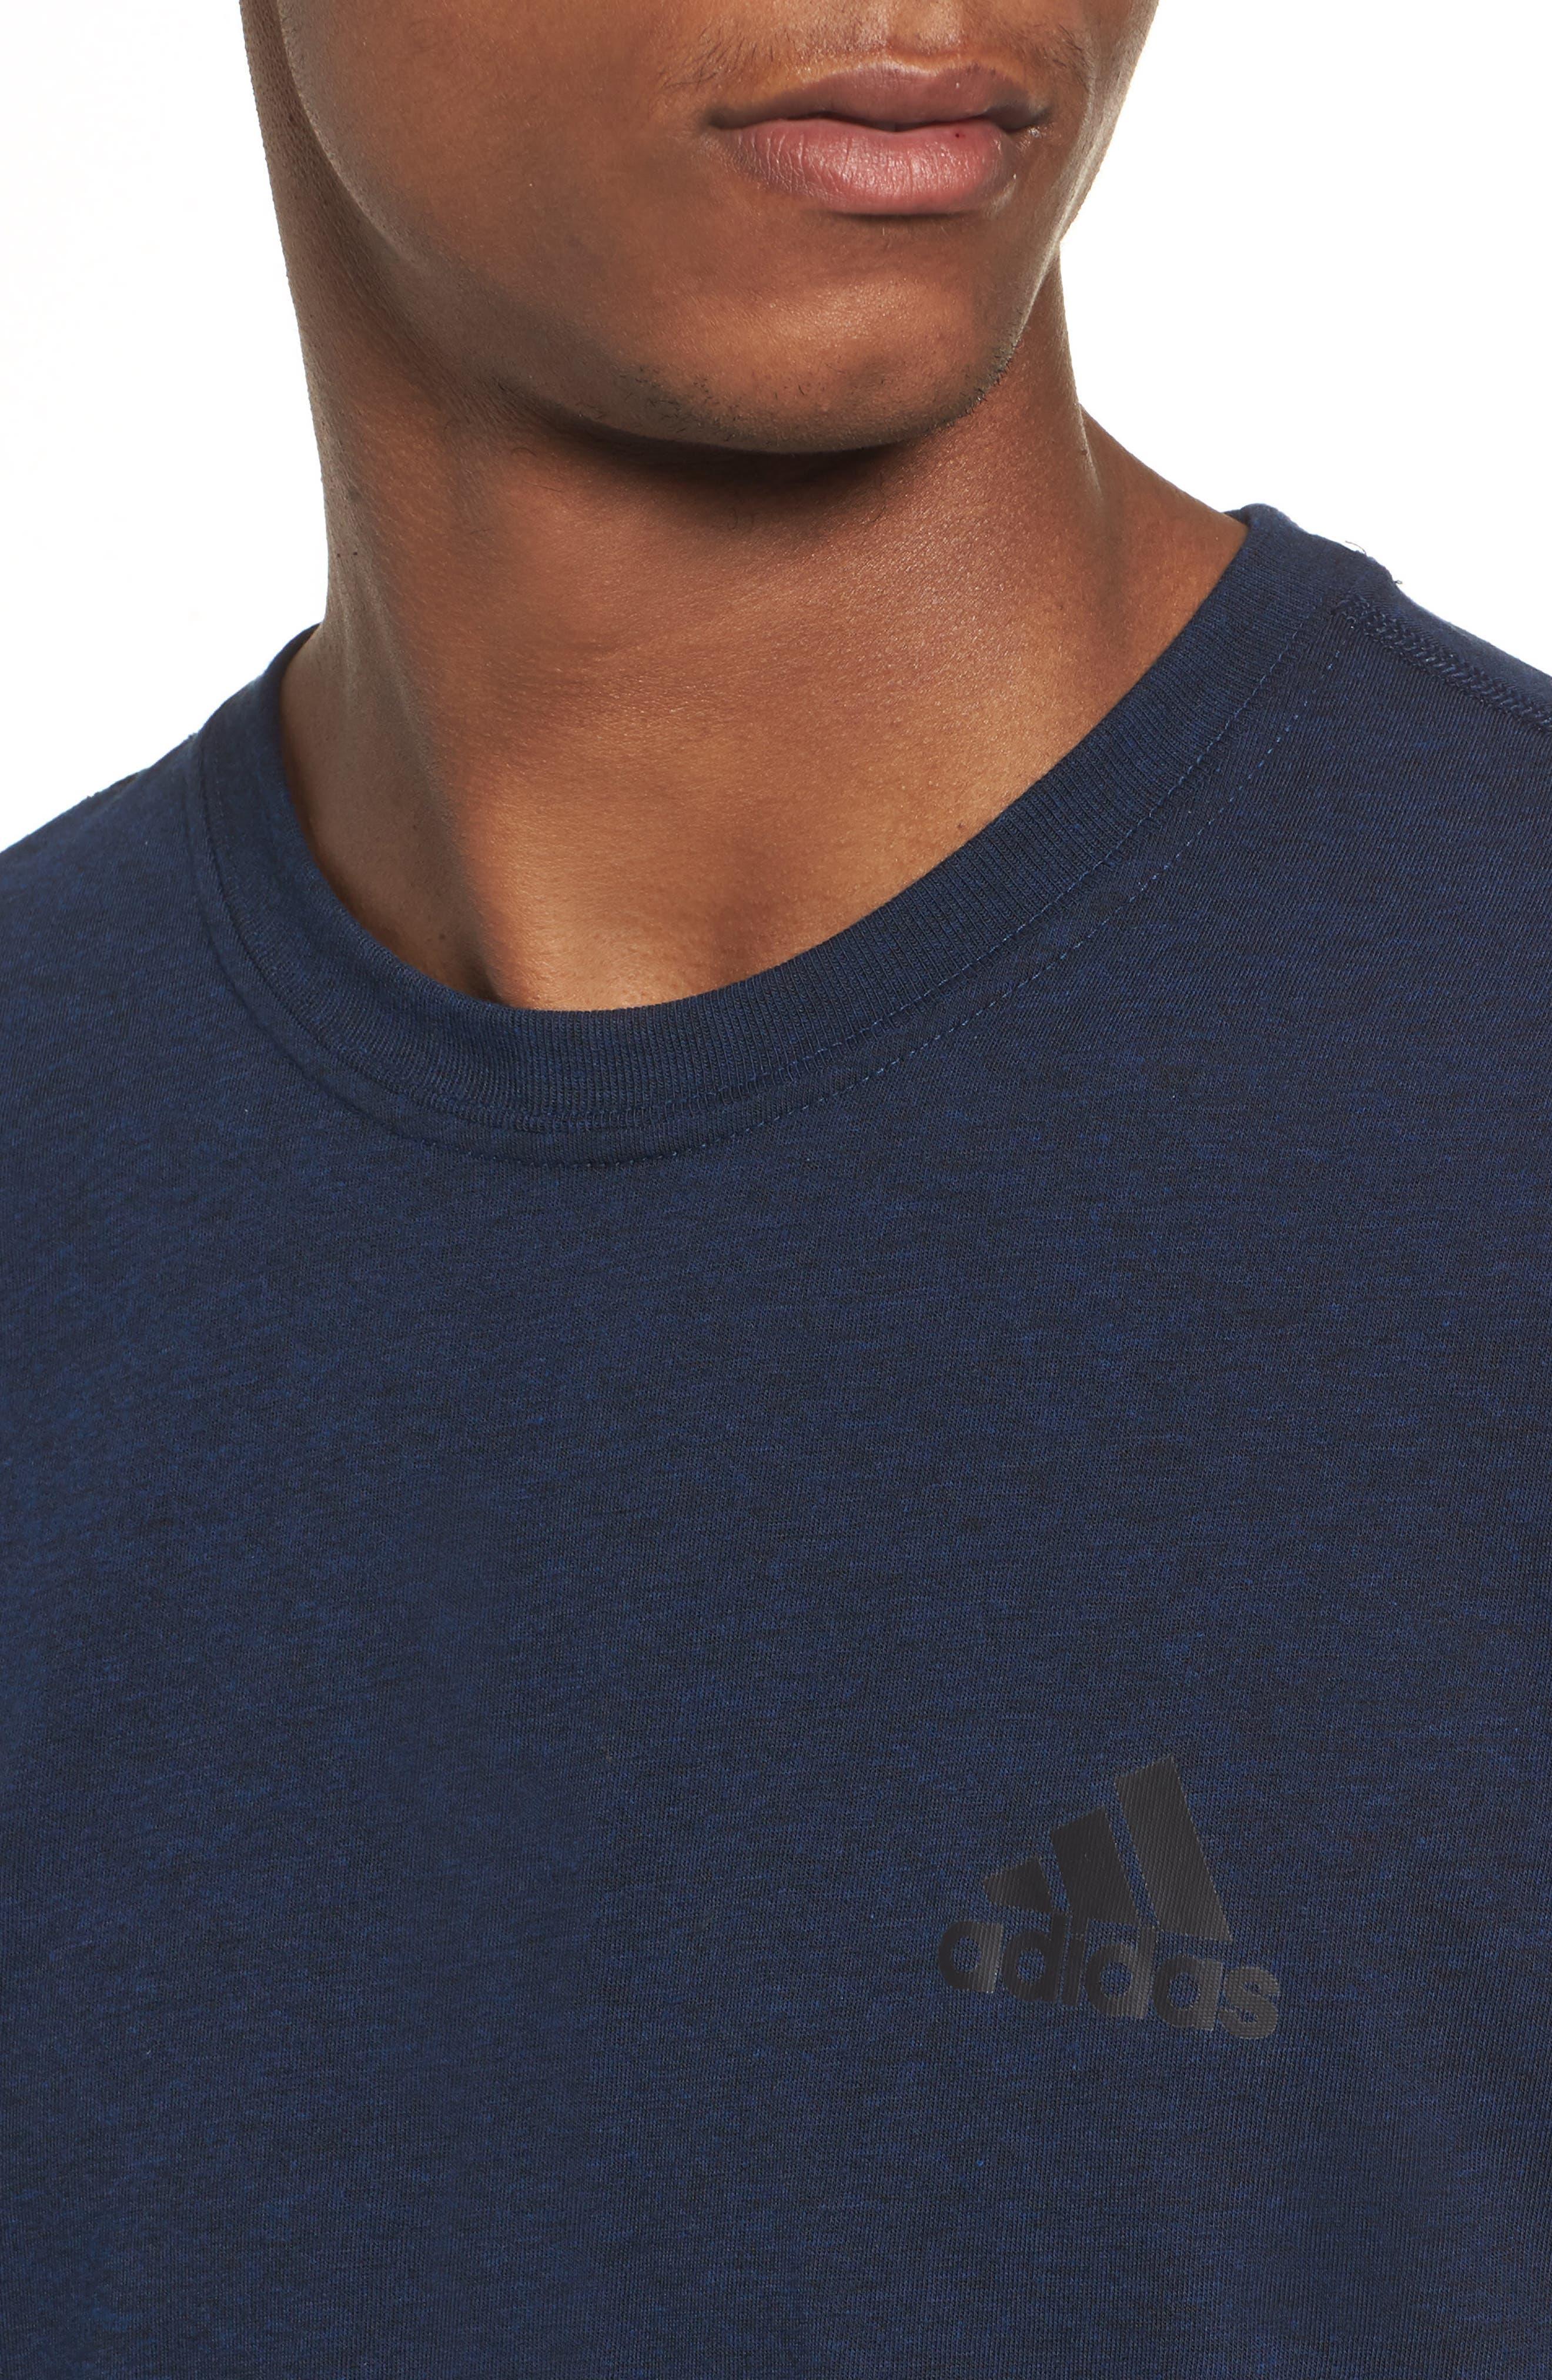 Ult Crewneck T-Shirt,                             Alternate thumbnail 4, color,                             002